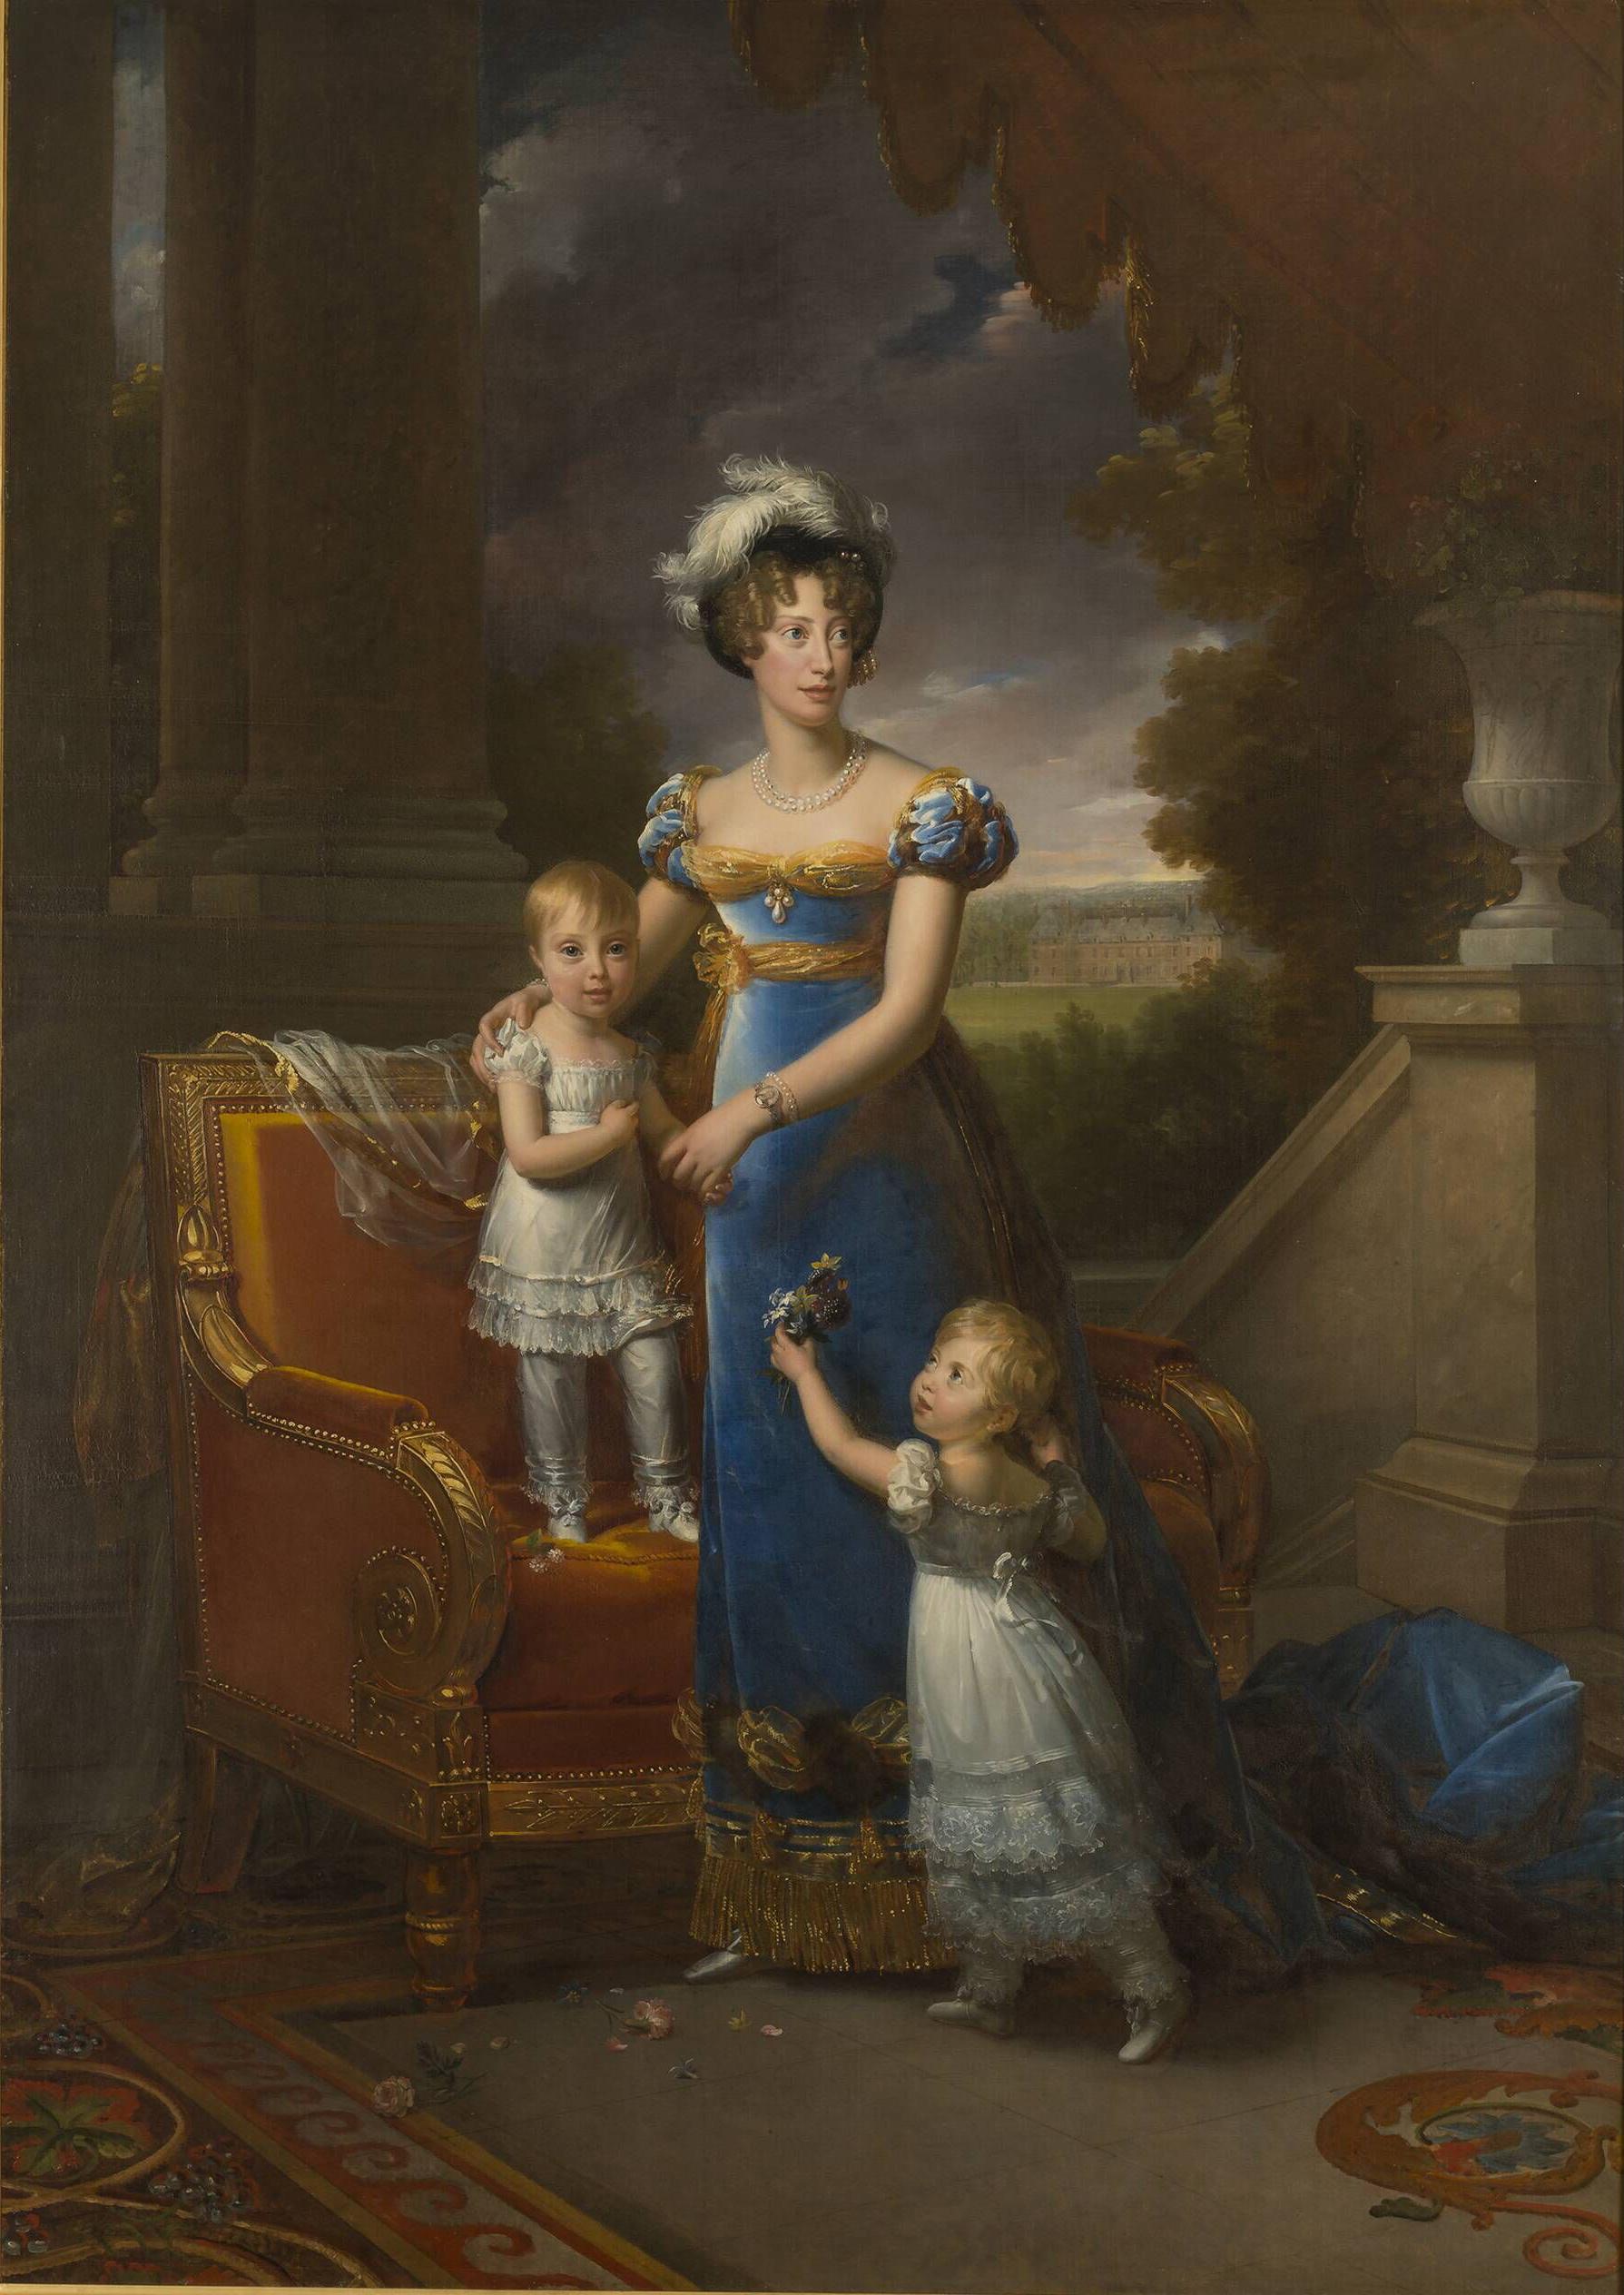 http://upload.wikimedia.org/wikipedia/commons/3/39/Fran%C3%A7ois_G%C3%A9rard_-_La_duchesse_de_Berry_et_ses_enfants,1822.jpg